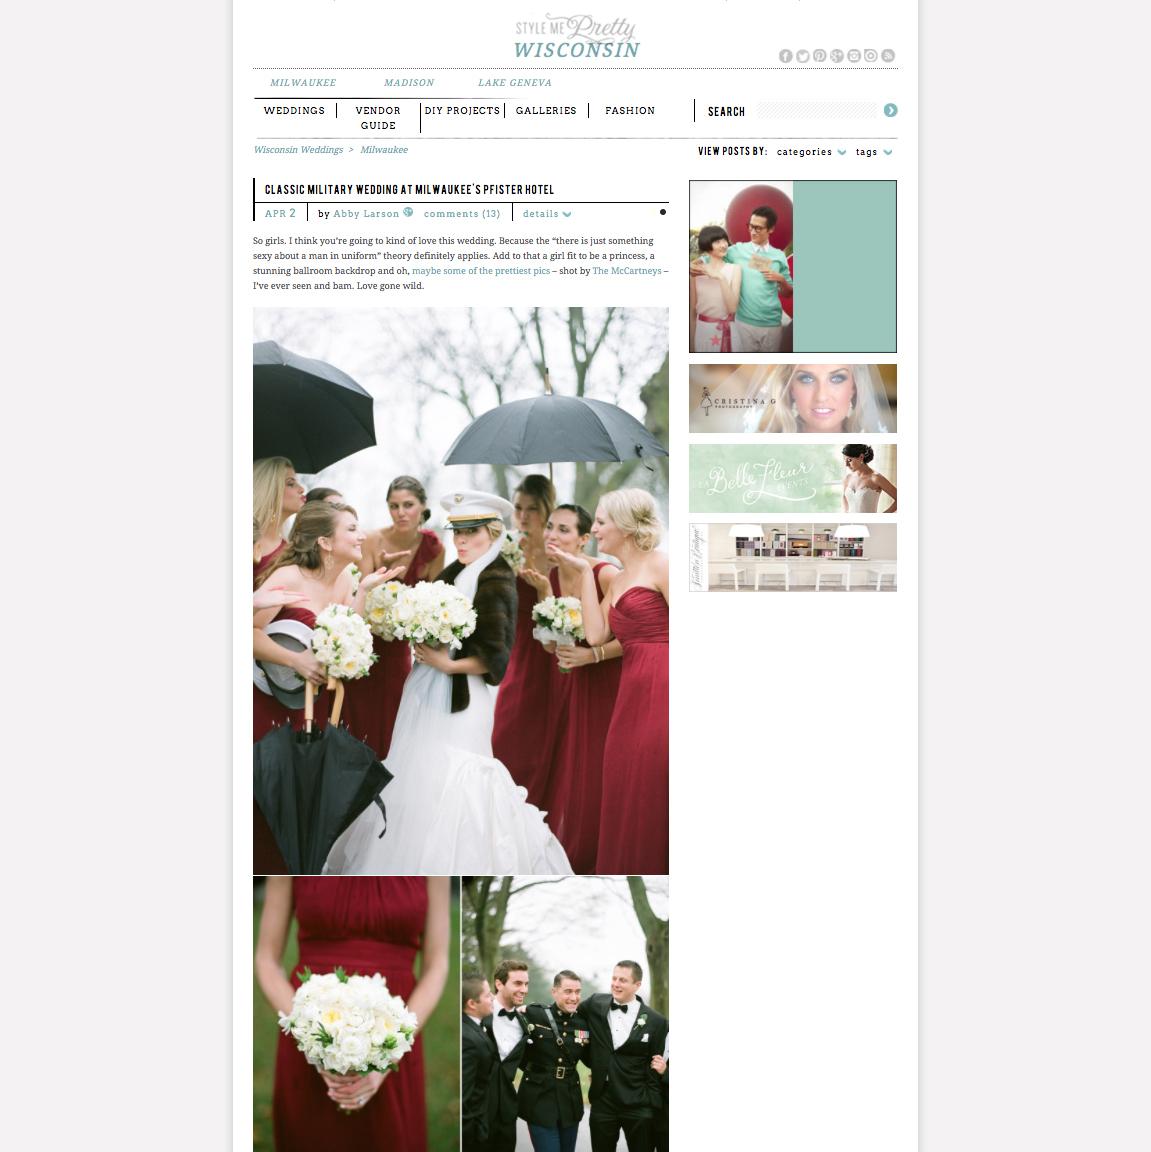 Pfister-Milwaukee-Wisconsin-Weddings